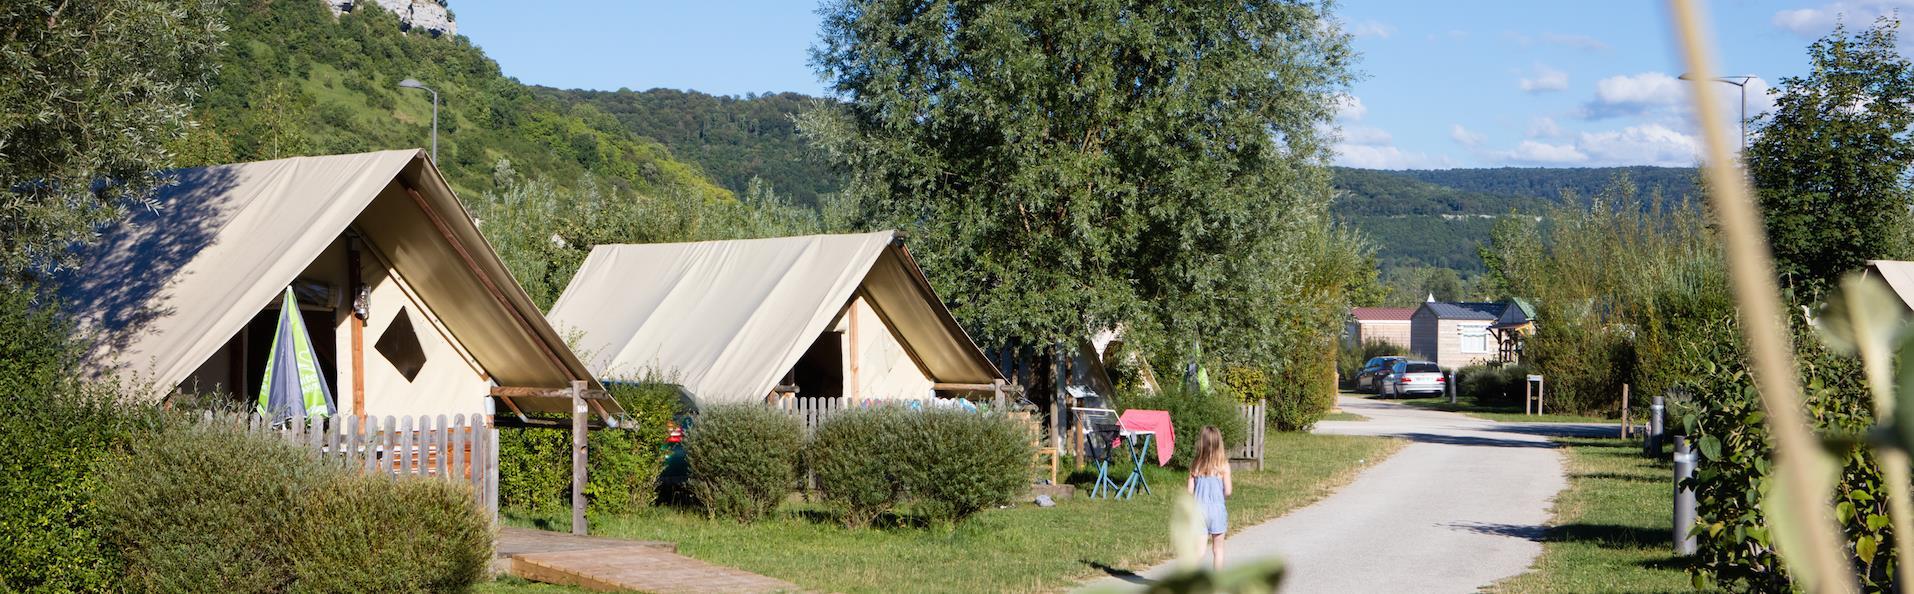 Camping la Roche d'Ully, Ornans, Doubs